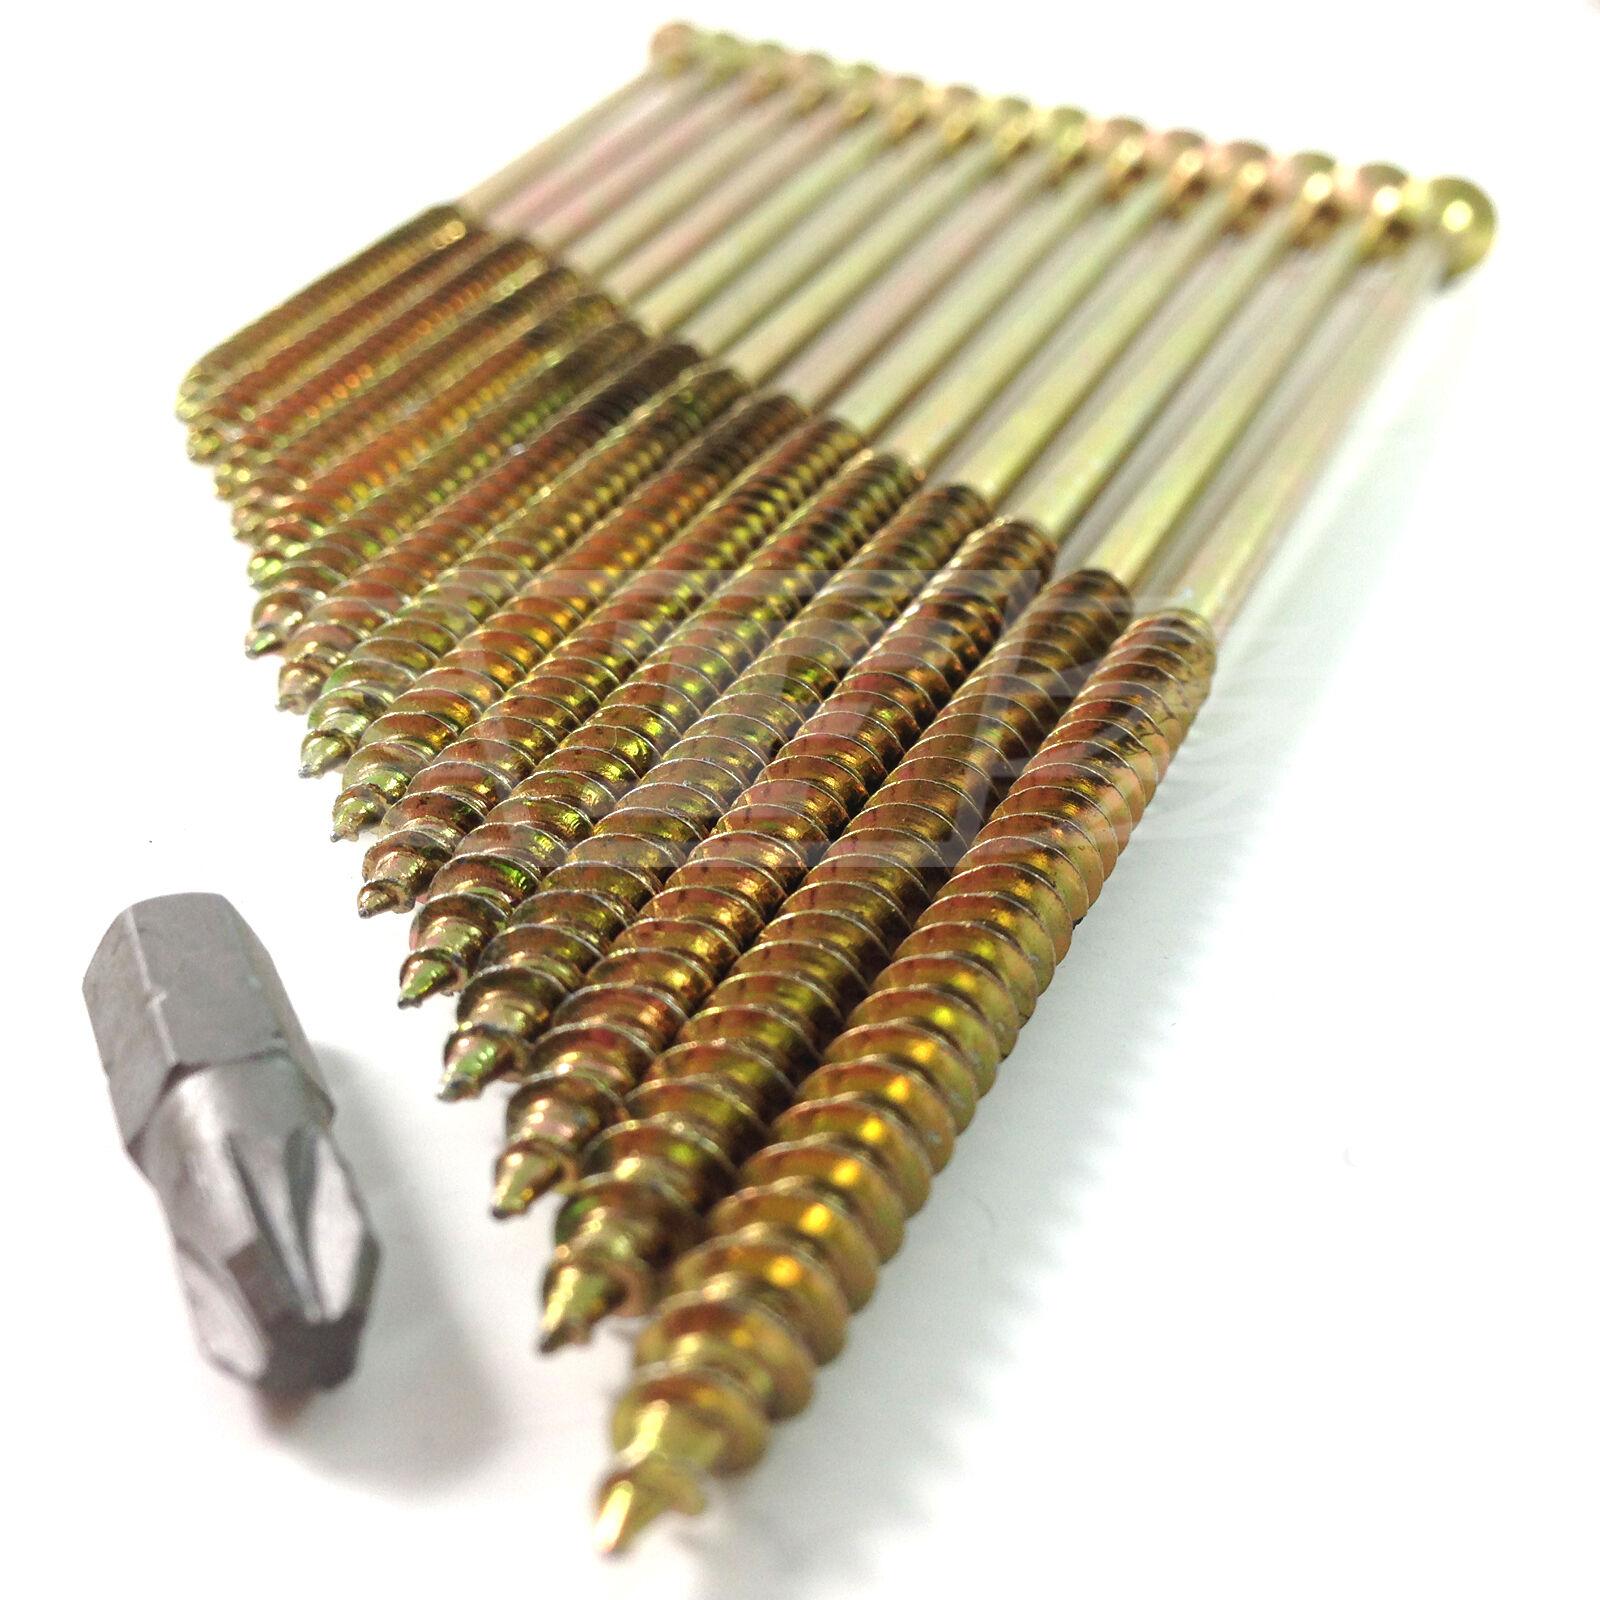 12g x 4  - 6mm x 100mm TIMCO CLASSIC PROFESSIONAL WOOD SCREWS POZI COUNTERSUNK